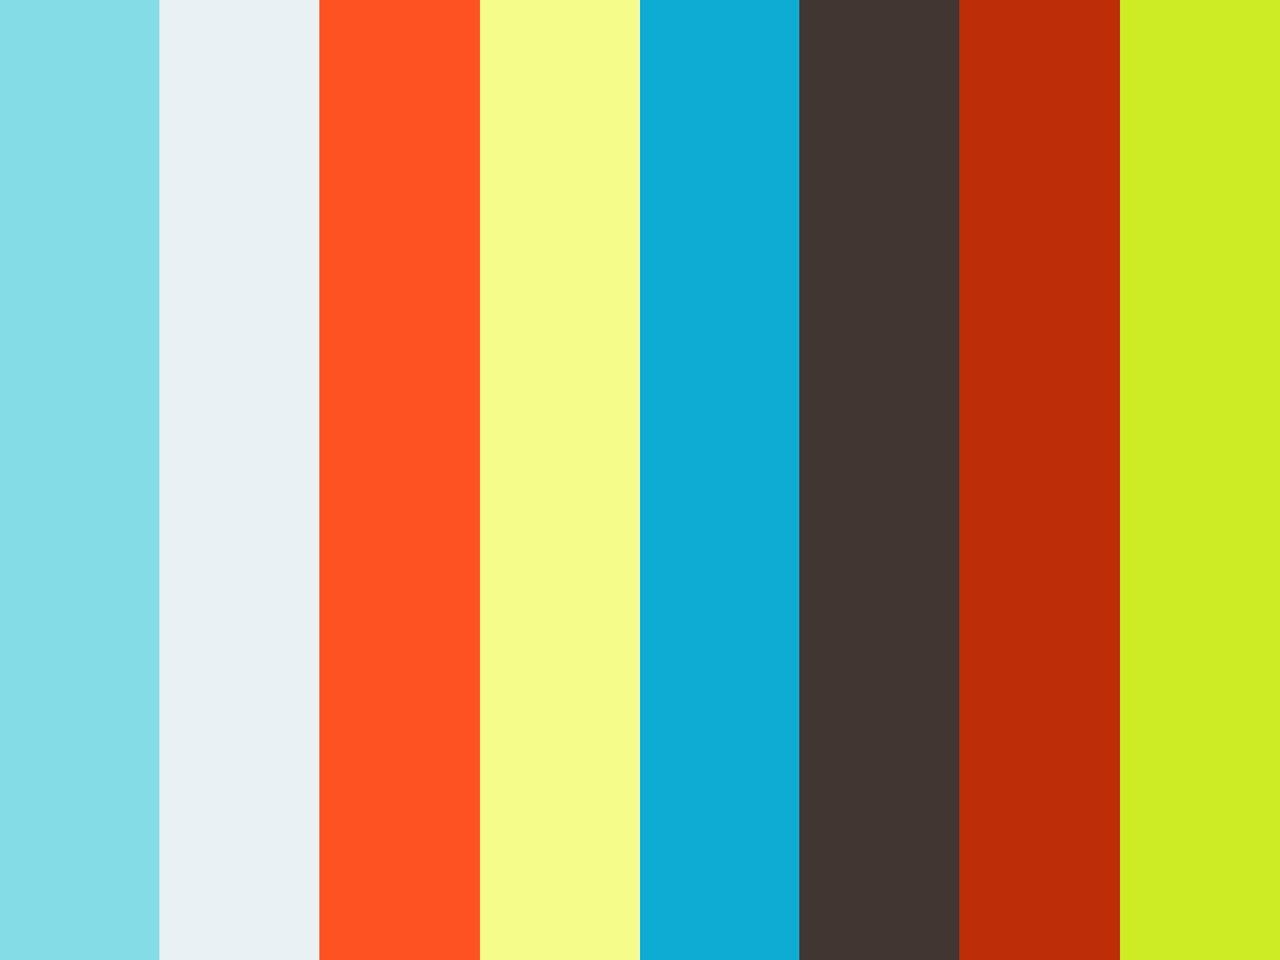 Molokai Covid19 Update - Thursday, April 16, 2020